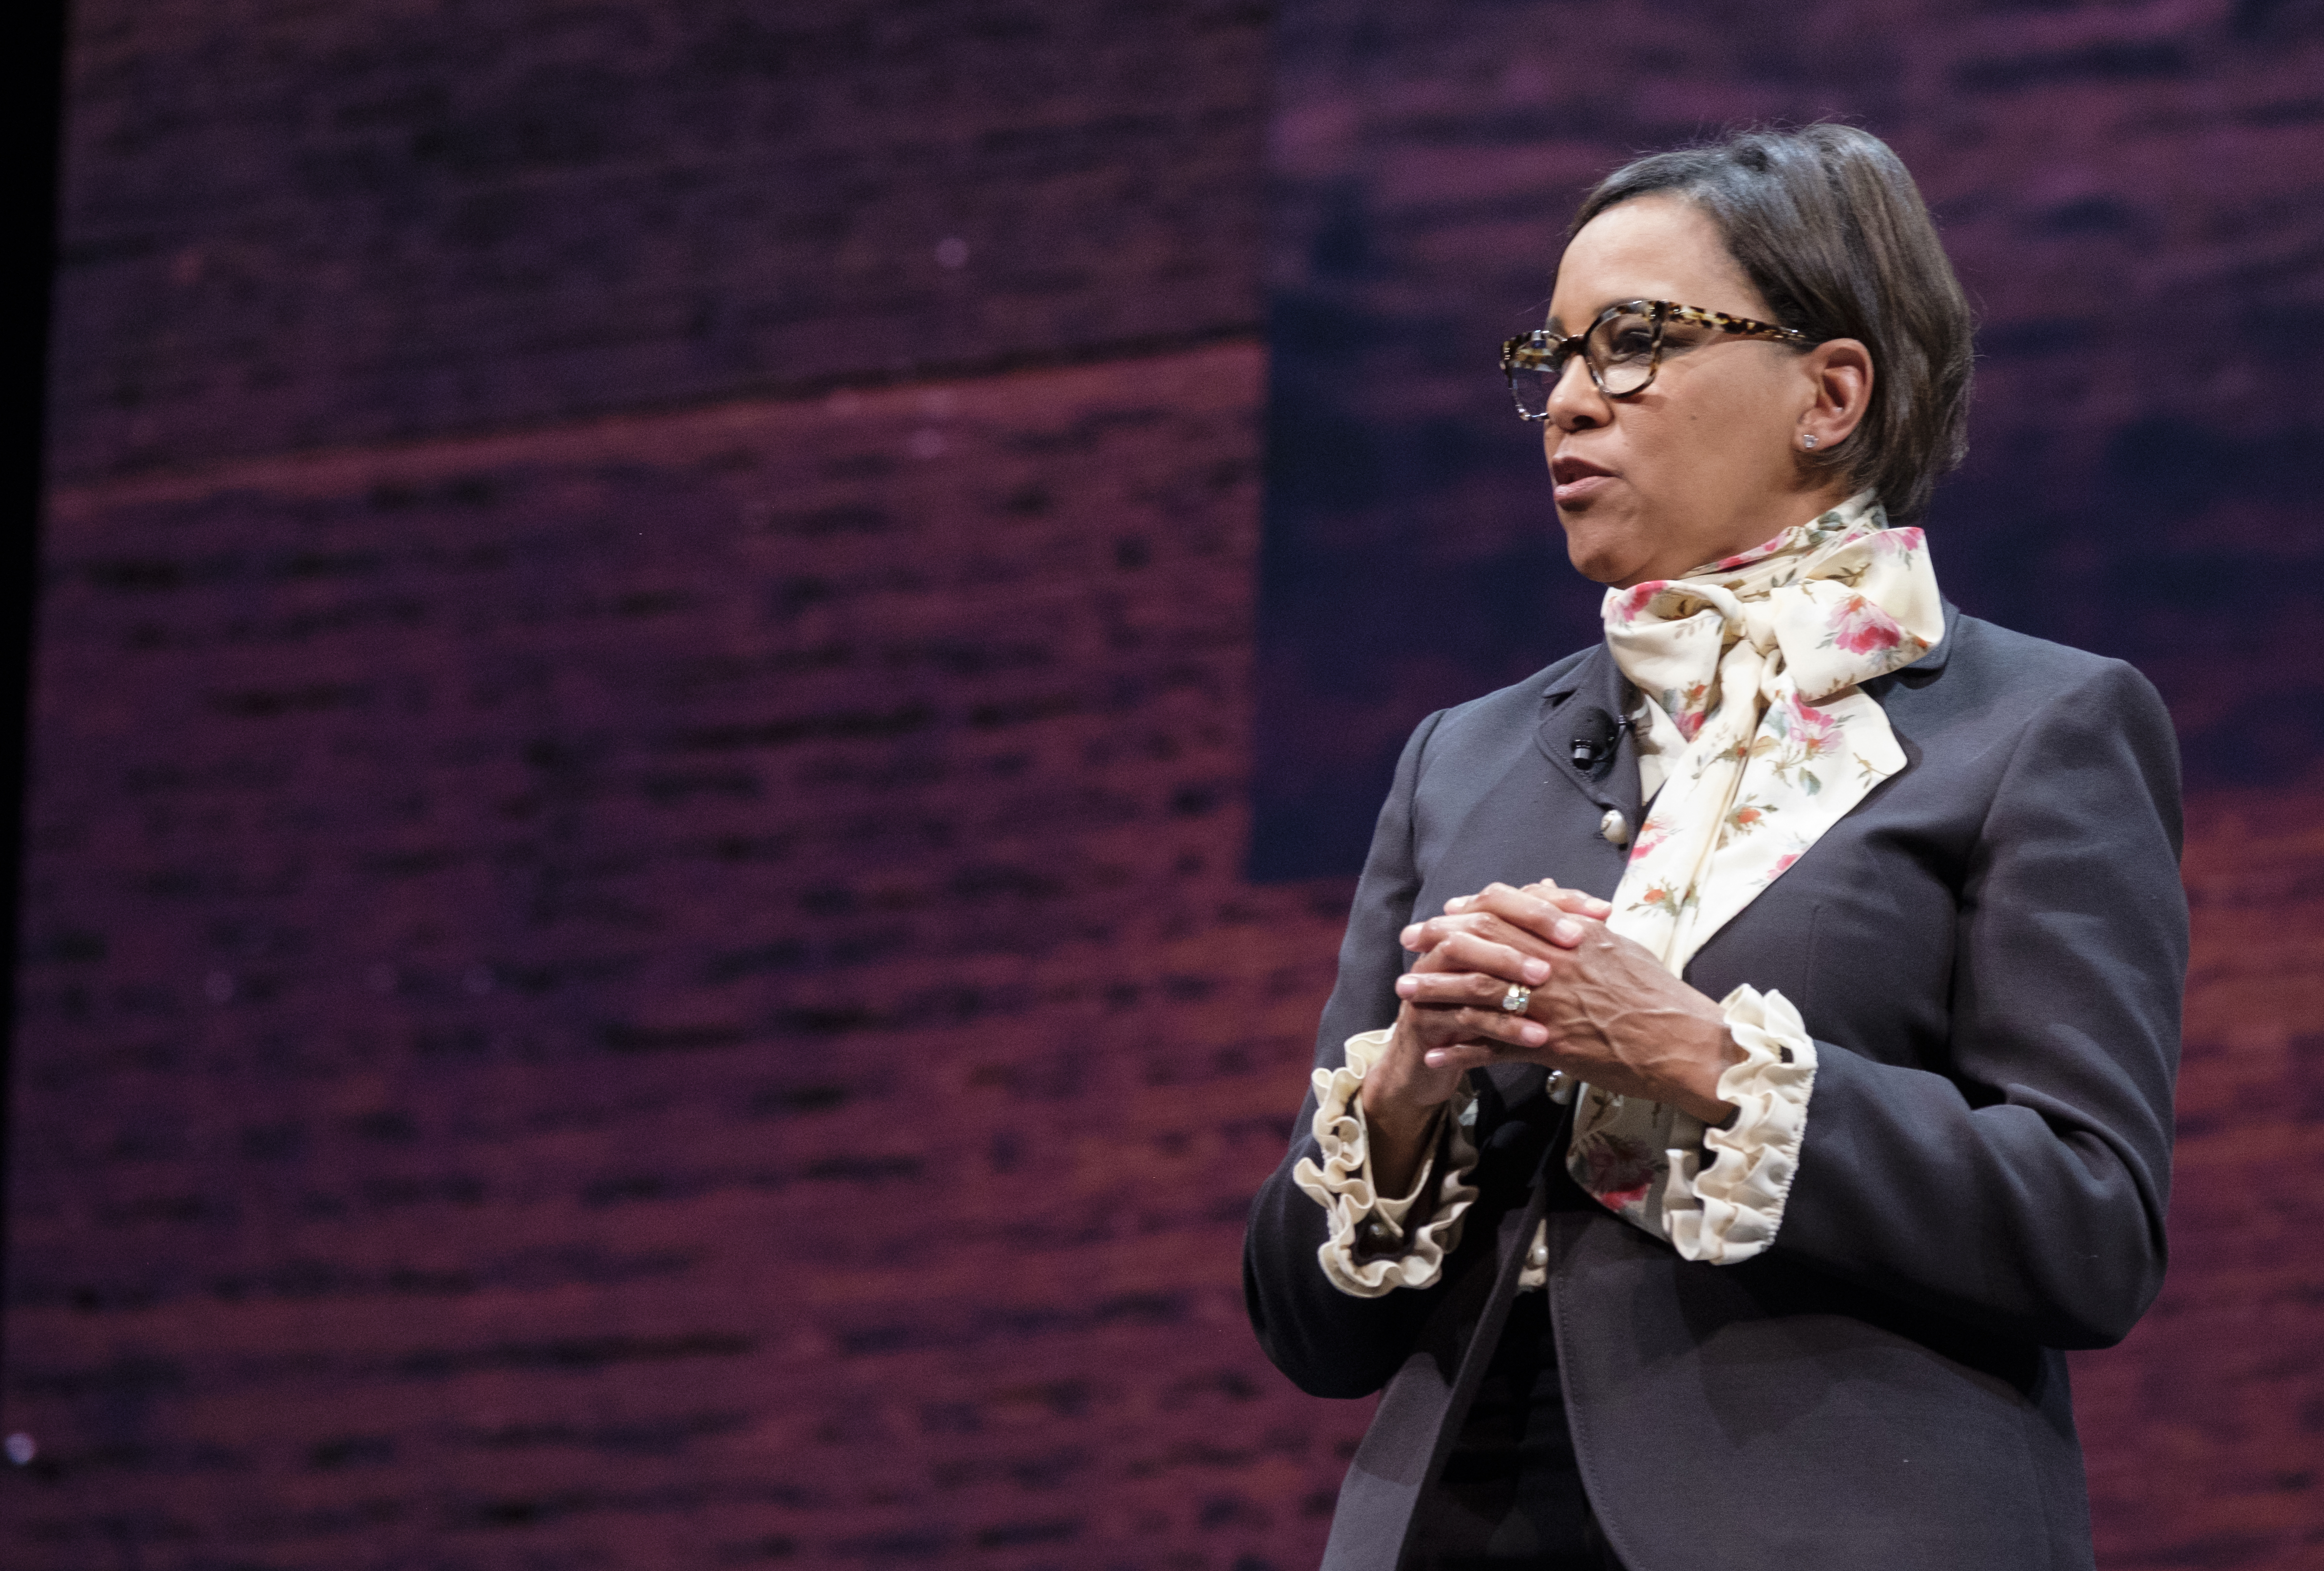 Starbucks Chief Operating Officer Roz Brewer speaking onstage.